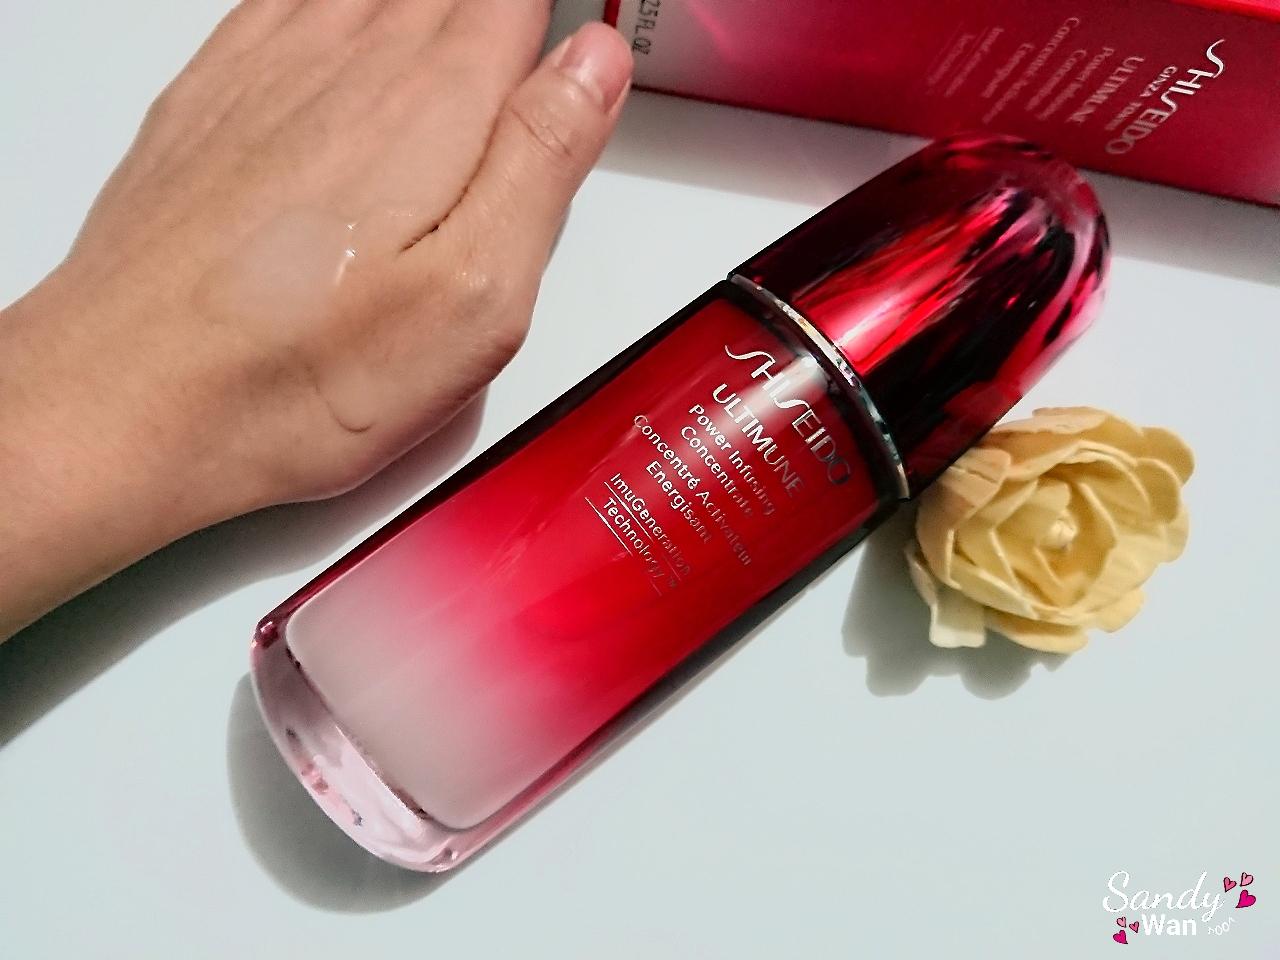 Beautylife HK - 好用到空瓶系列,把握免疫力提升關鍵72小時